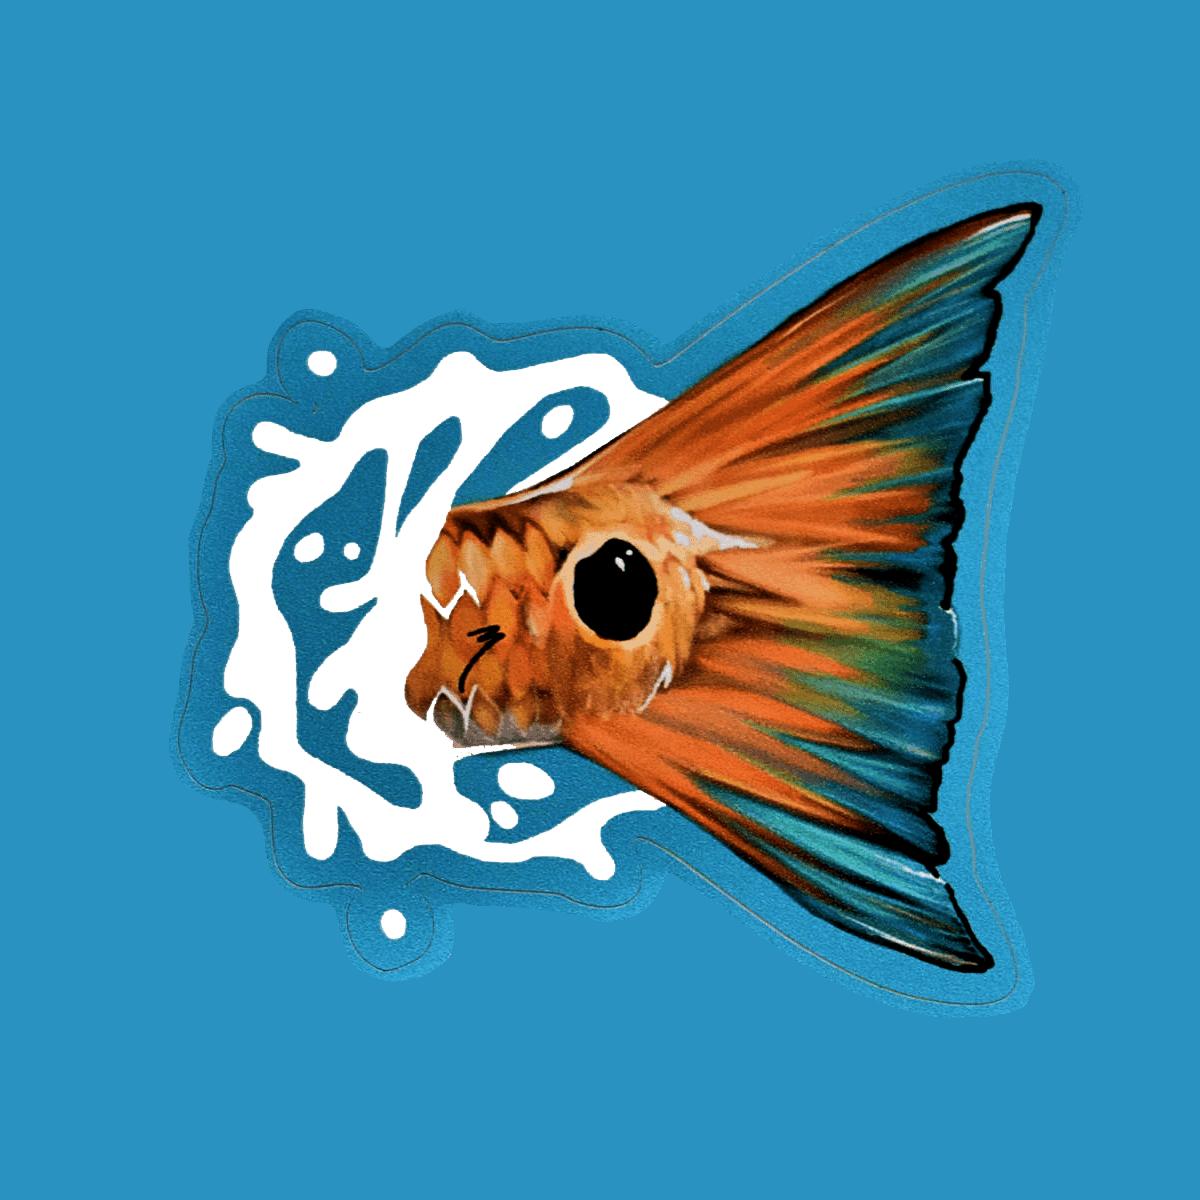 Redfish Fly Fishing Wallpaper